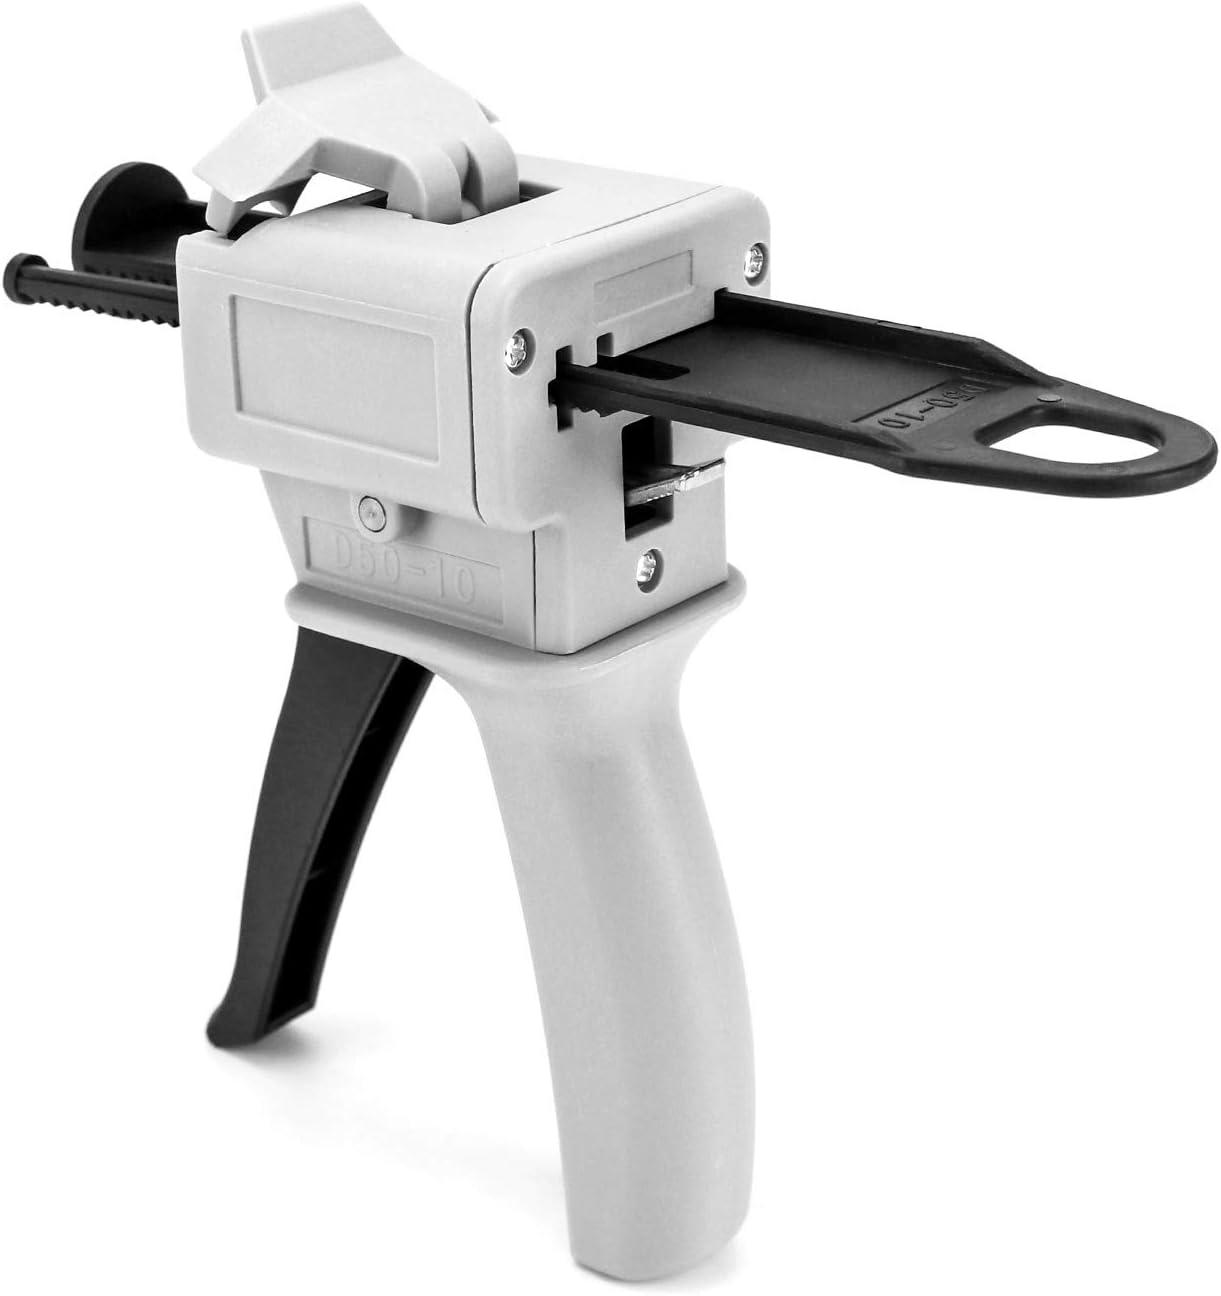 QWORK 50ml Dispensing Gun Kit Ratio Mixi Dental Seattle Mall Impression 10:1 2021new shipping free shipping